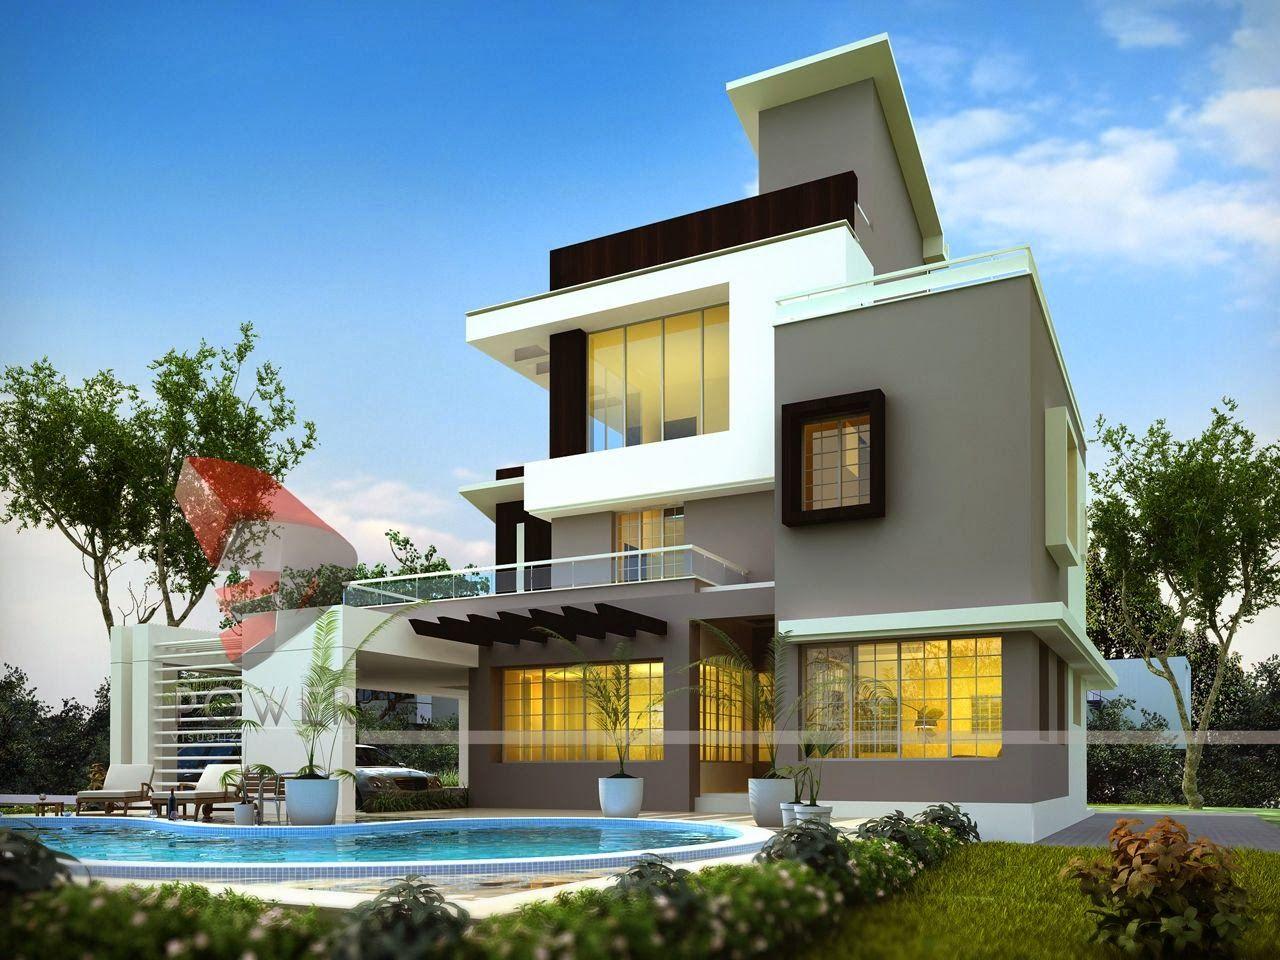 Pingl Par Preethikannarajan Sur Residence Elevations